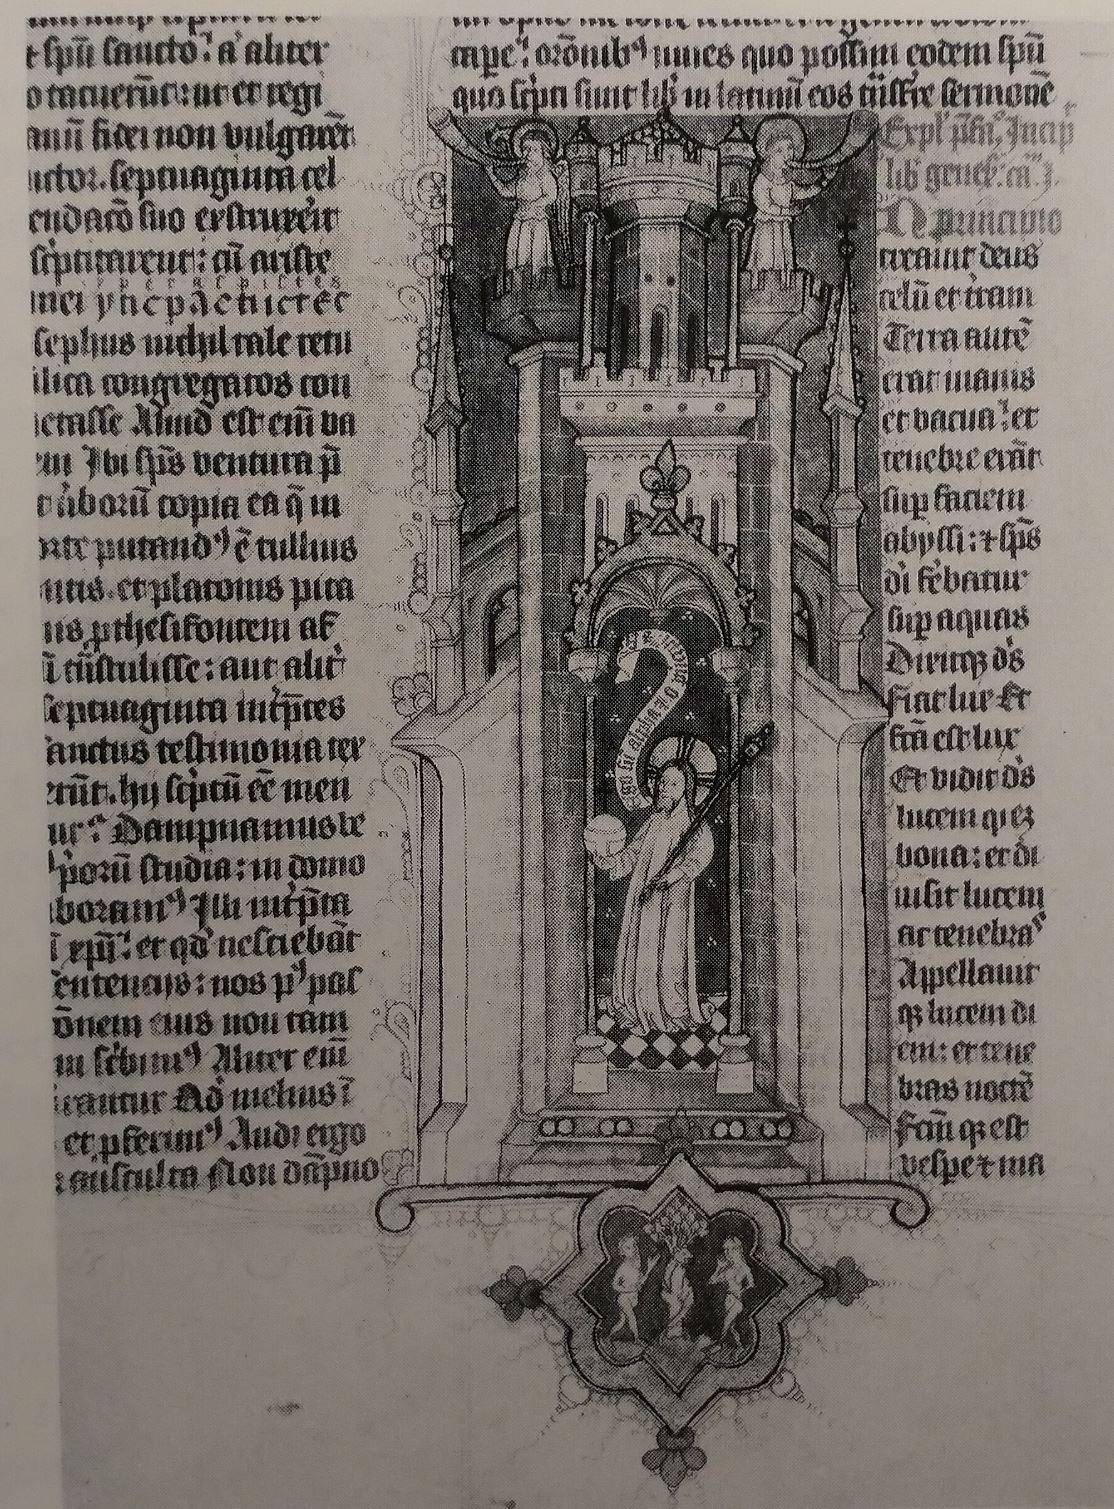 1410 ca Bible Hollandaise Kgl Bibliothek MS Thott 2 fol 4r